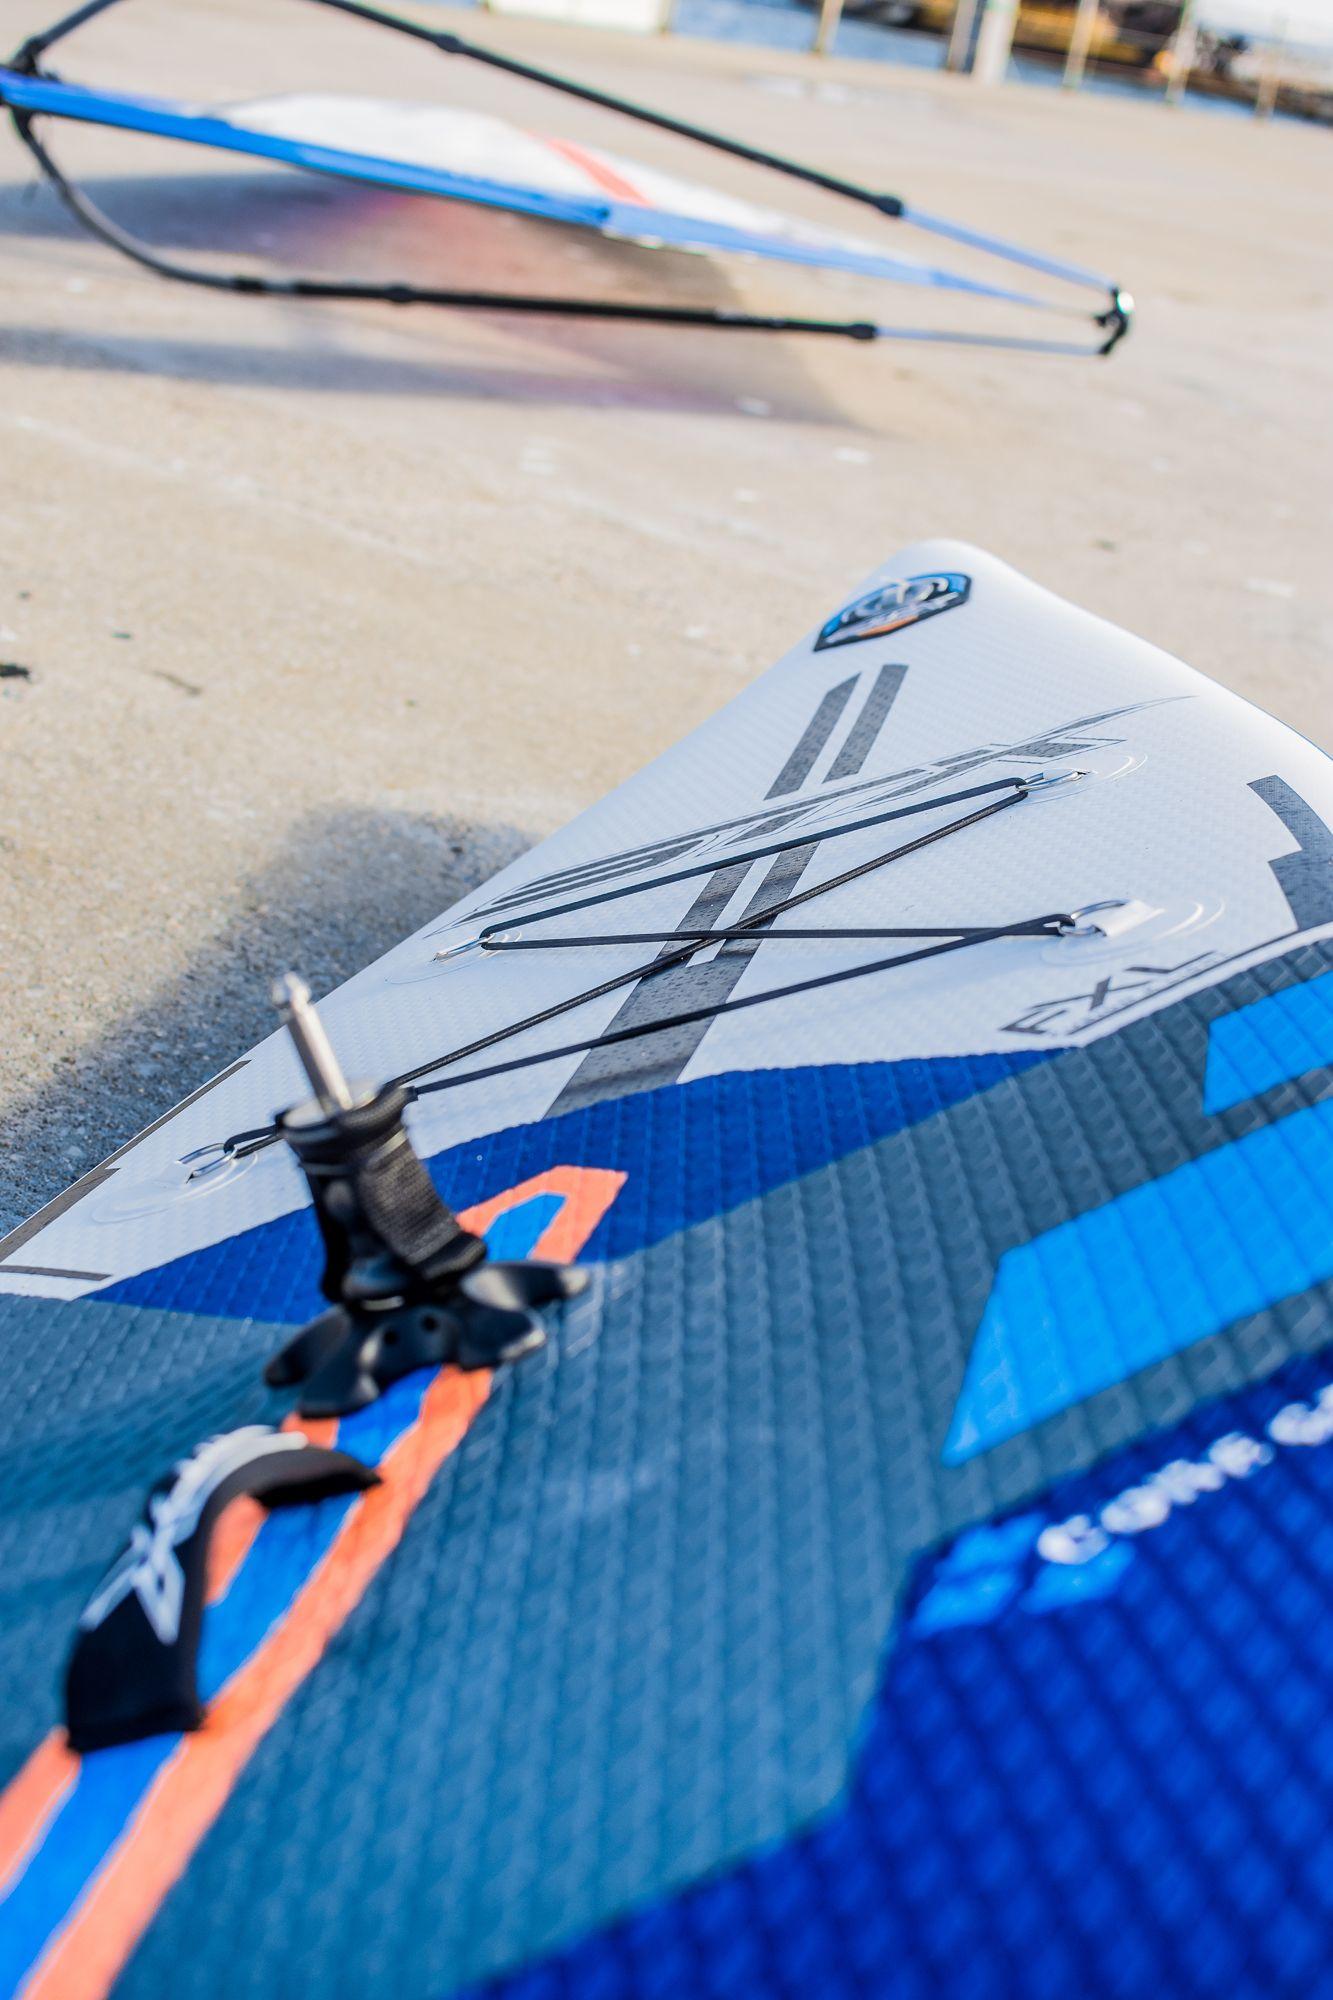 STX SUP Board hybrid